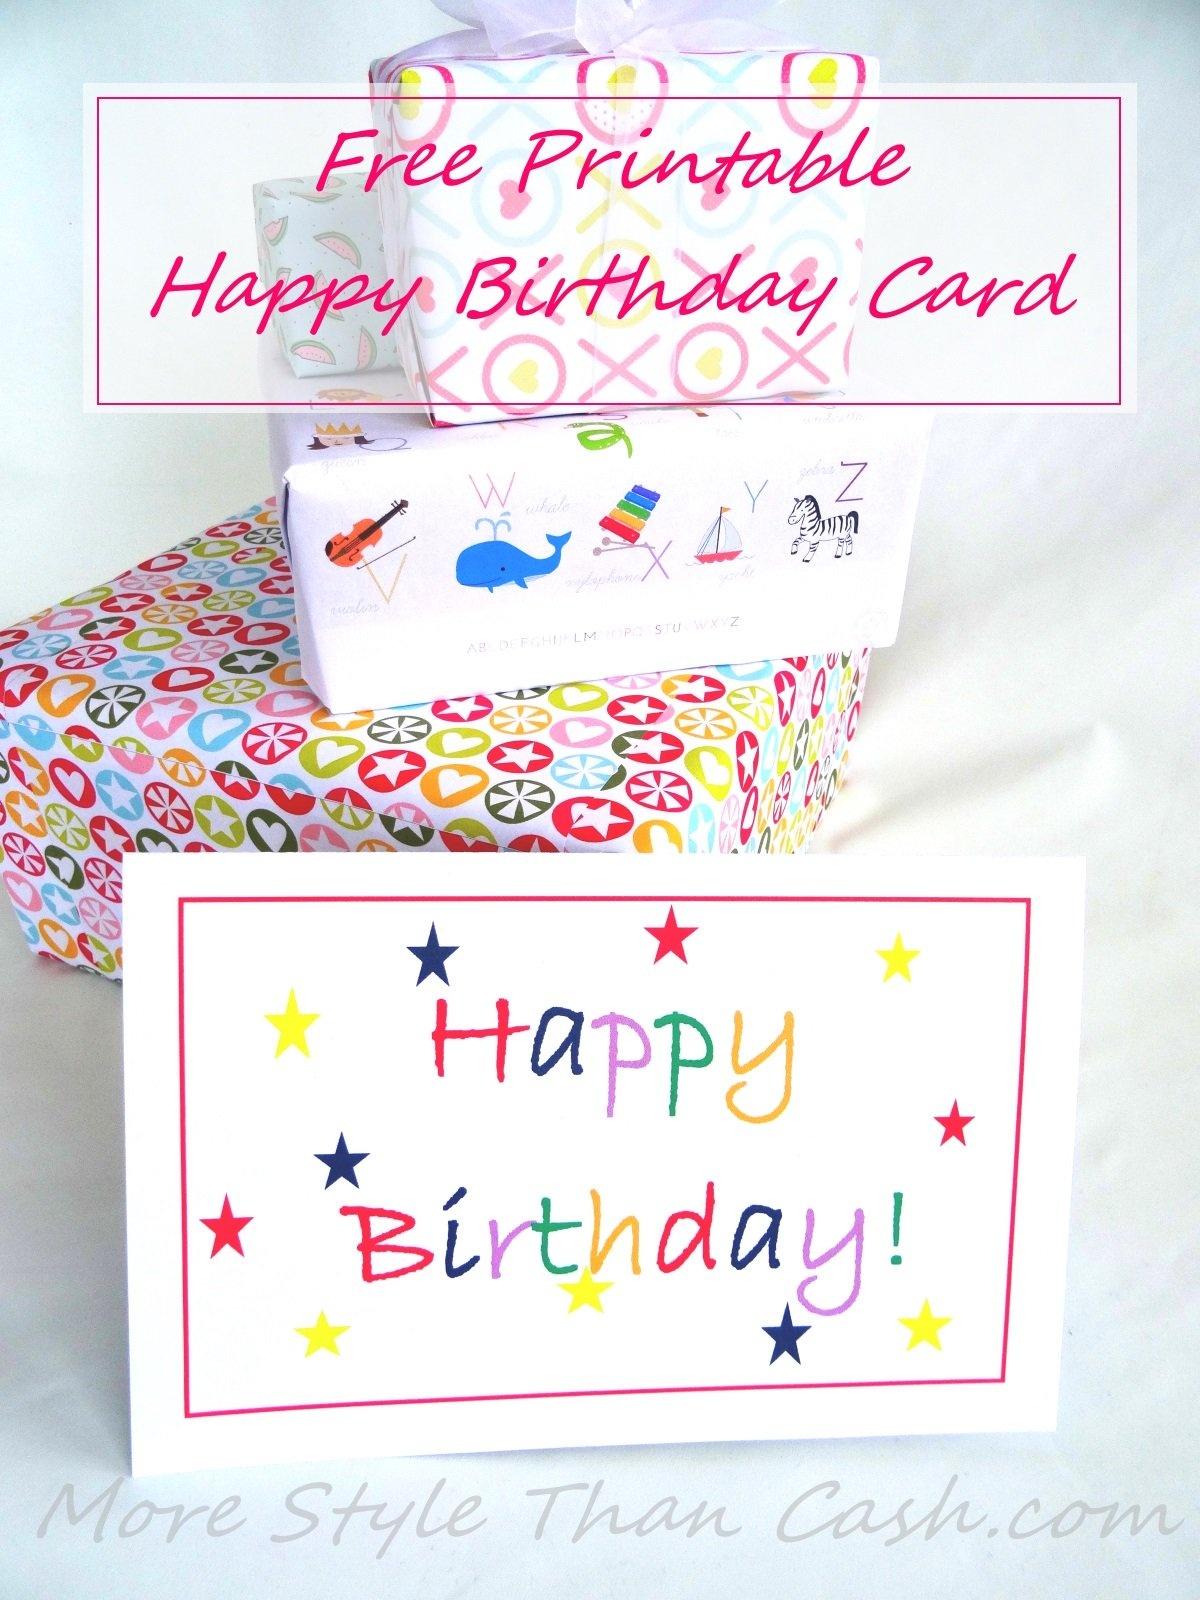 Free Printable Birthday Card - Free Printable Bday Cards